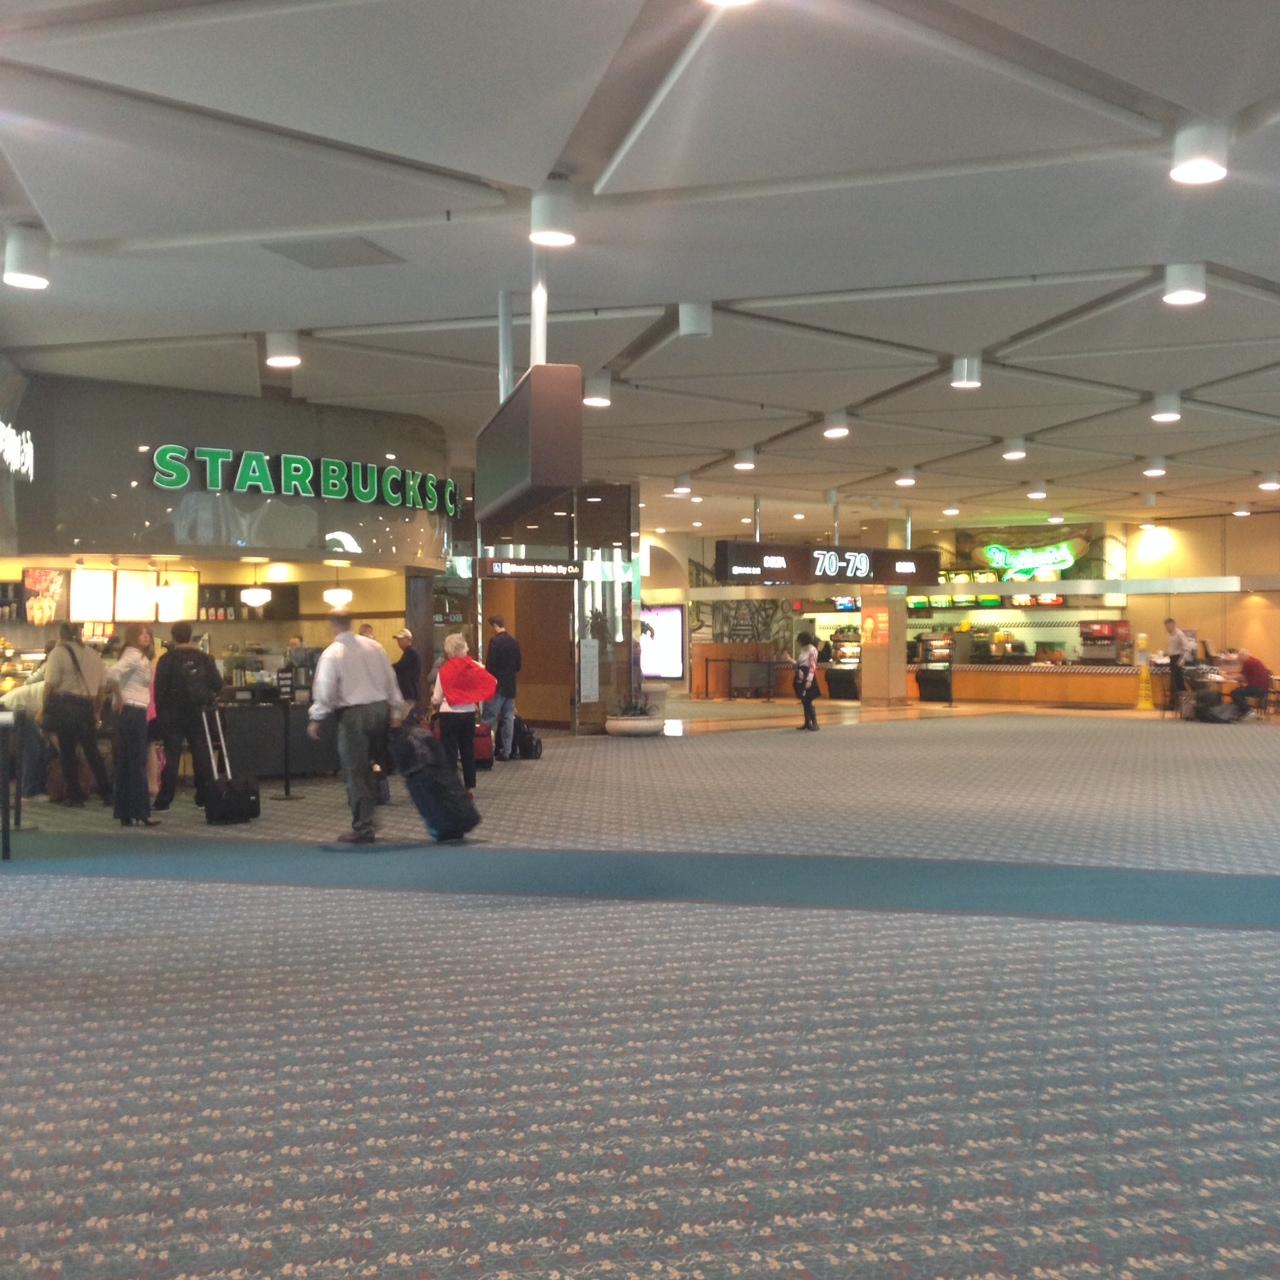 Starbucks-in-the-terminal.jpg